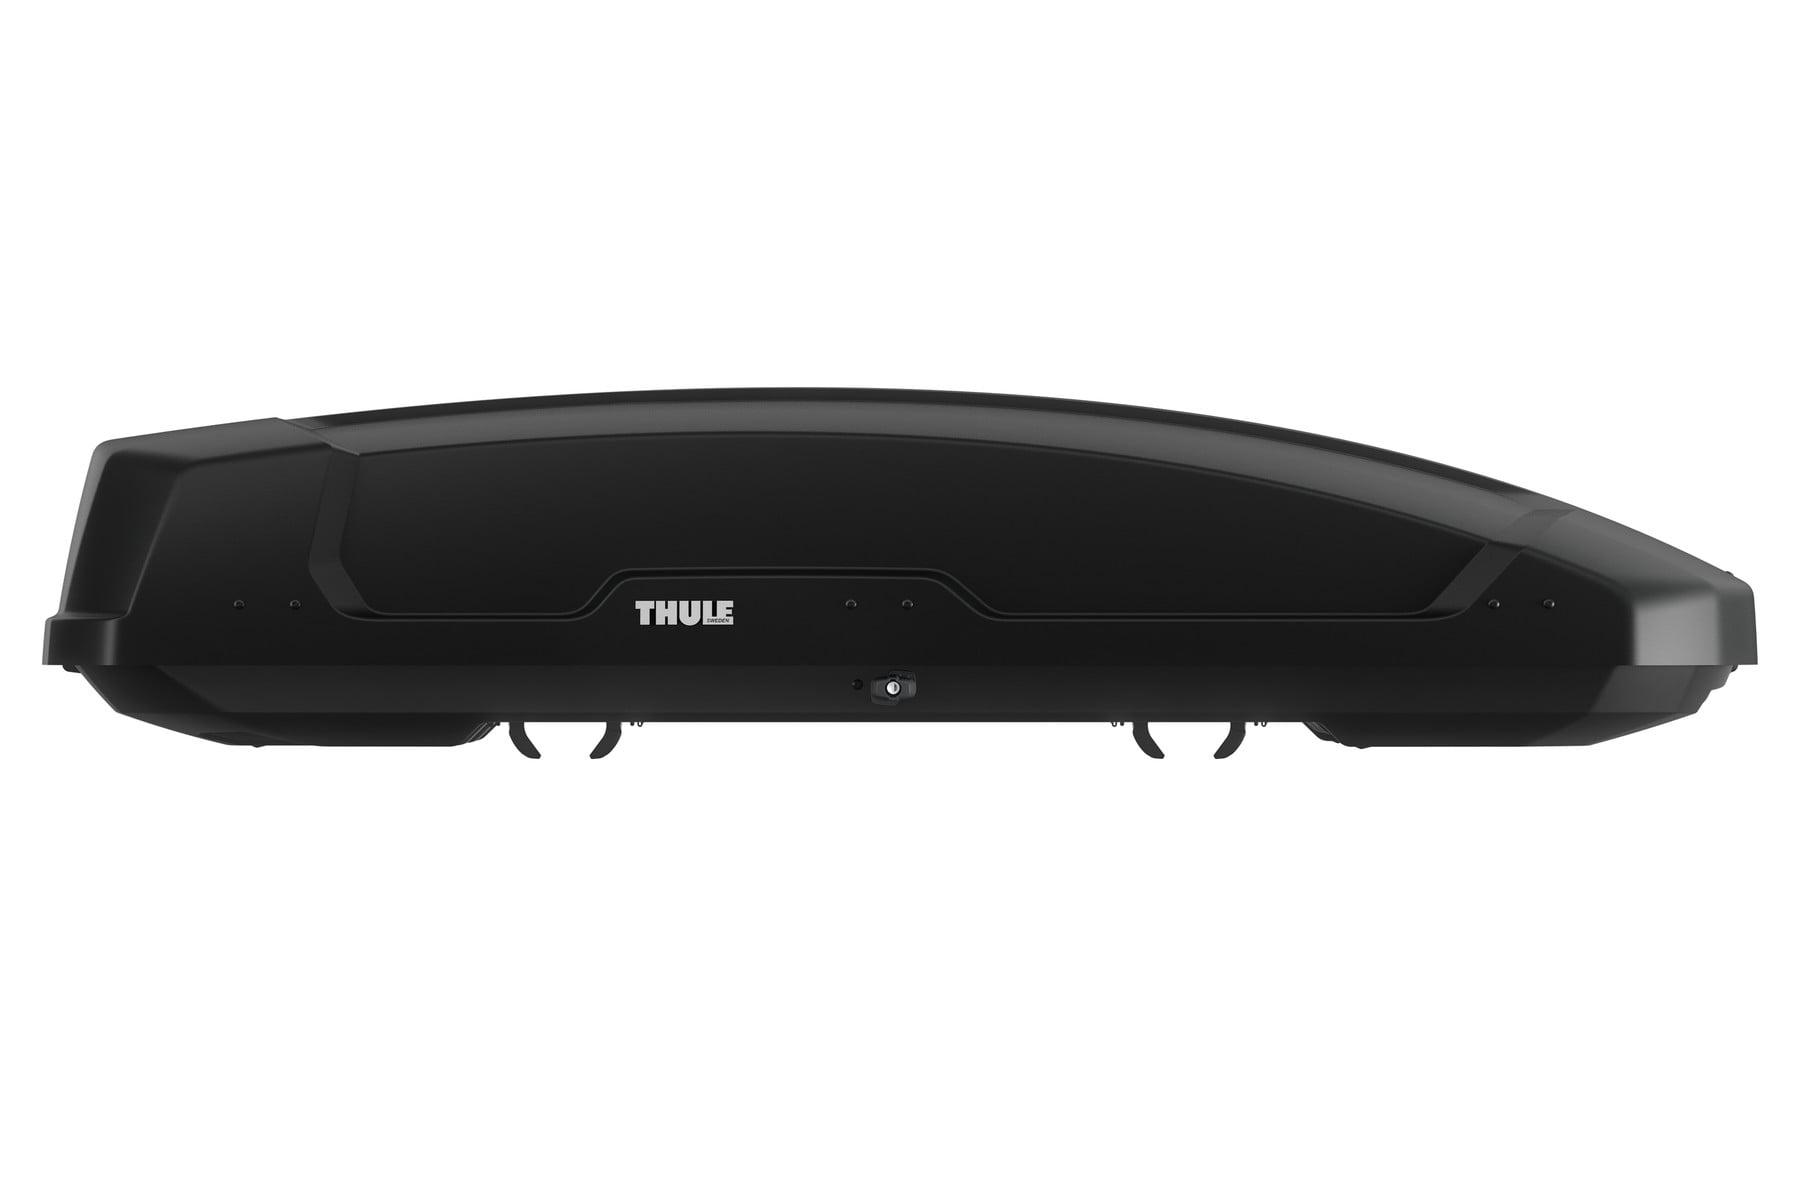 Thule Force XT XL 9